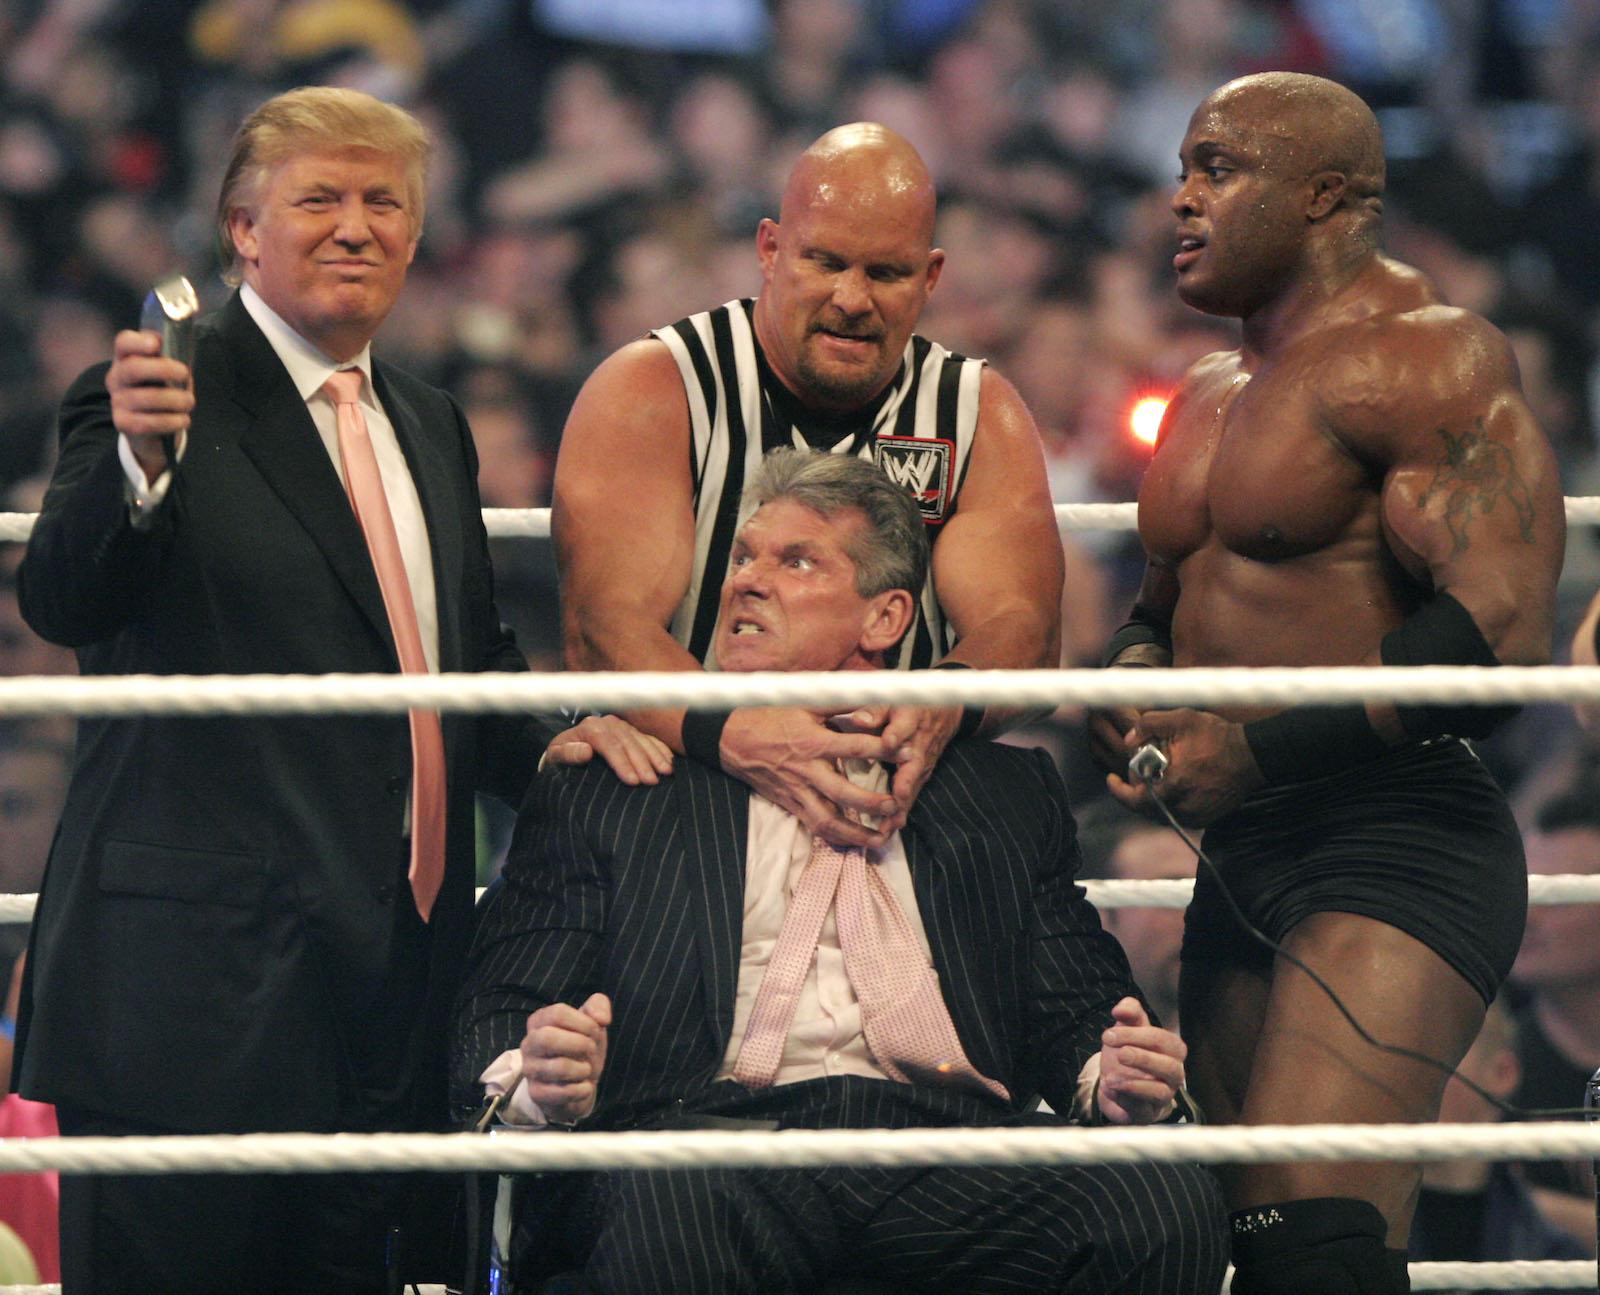 WWE Presents Wrestlemania 23